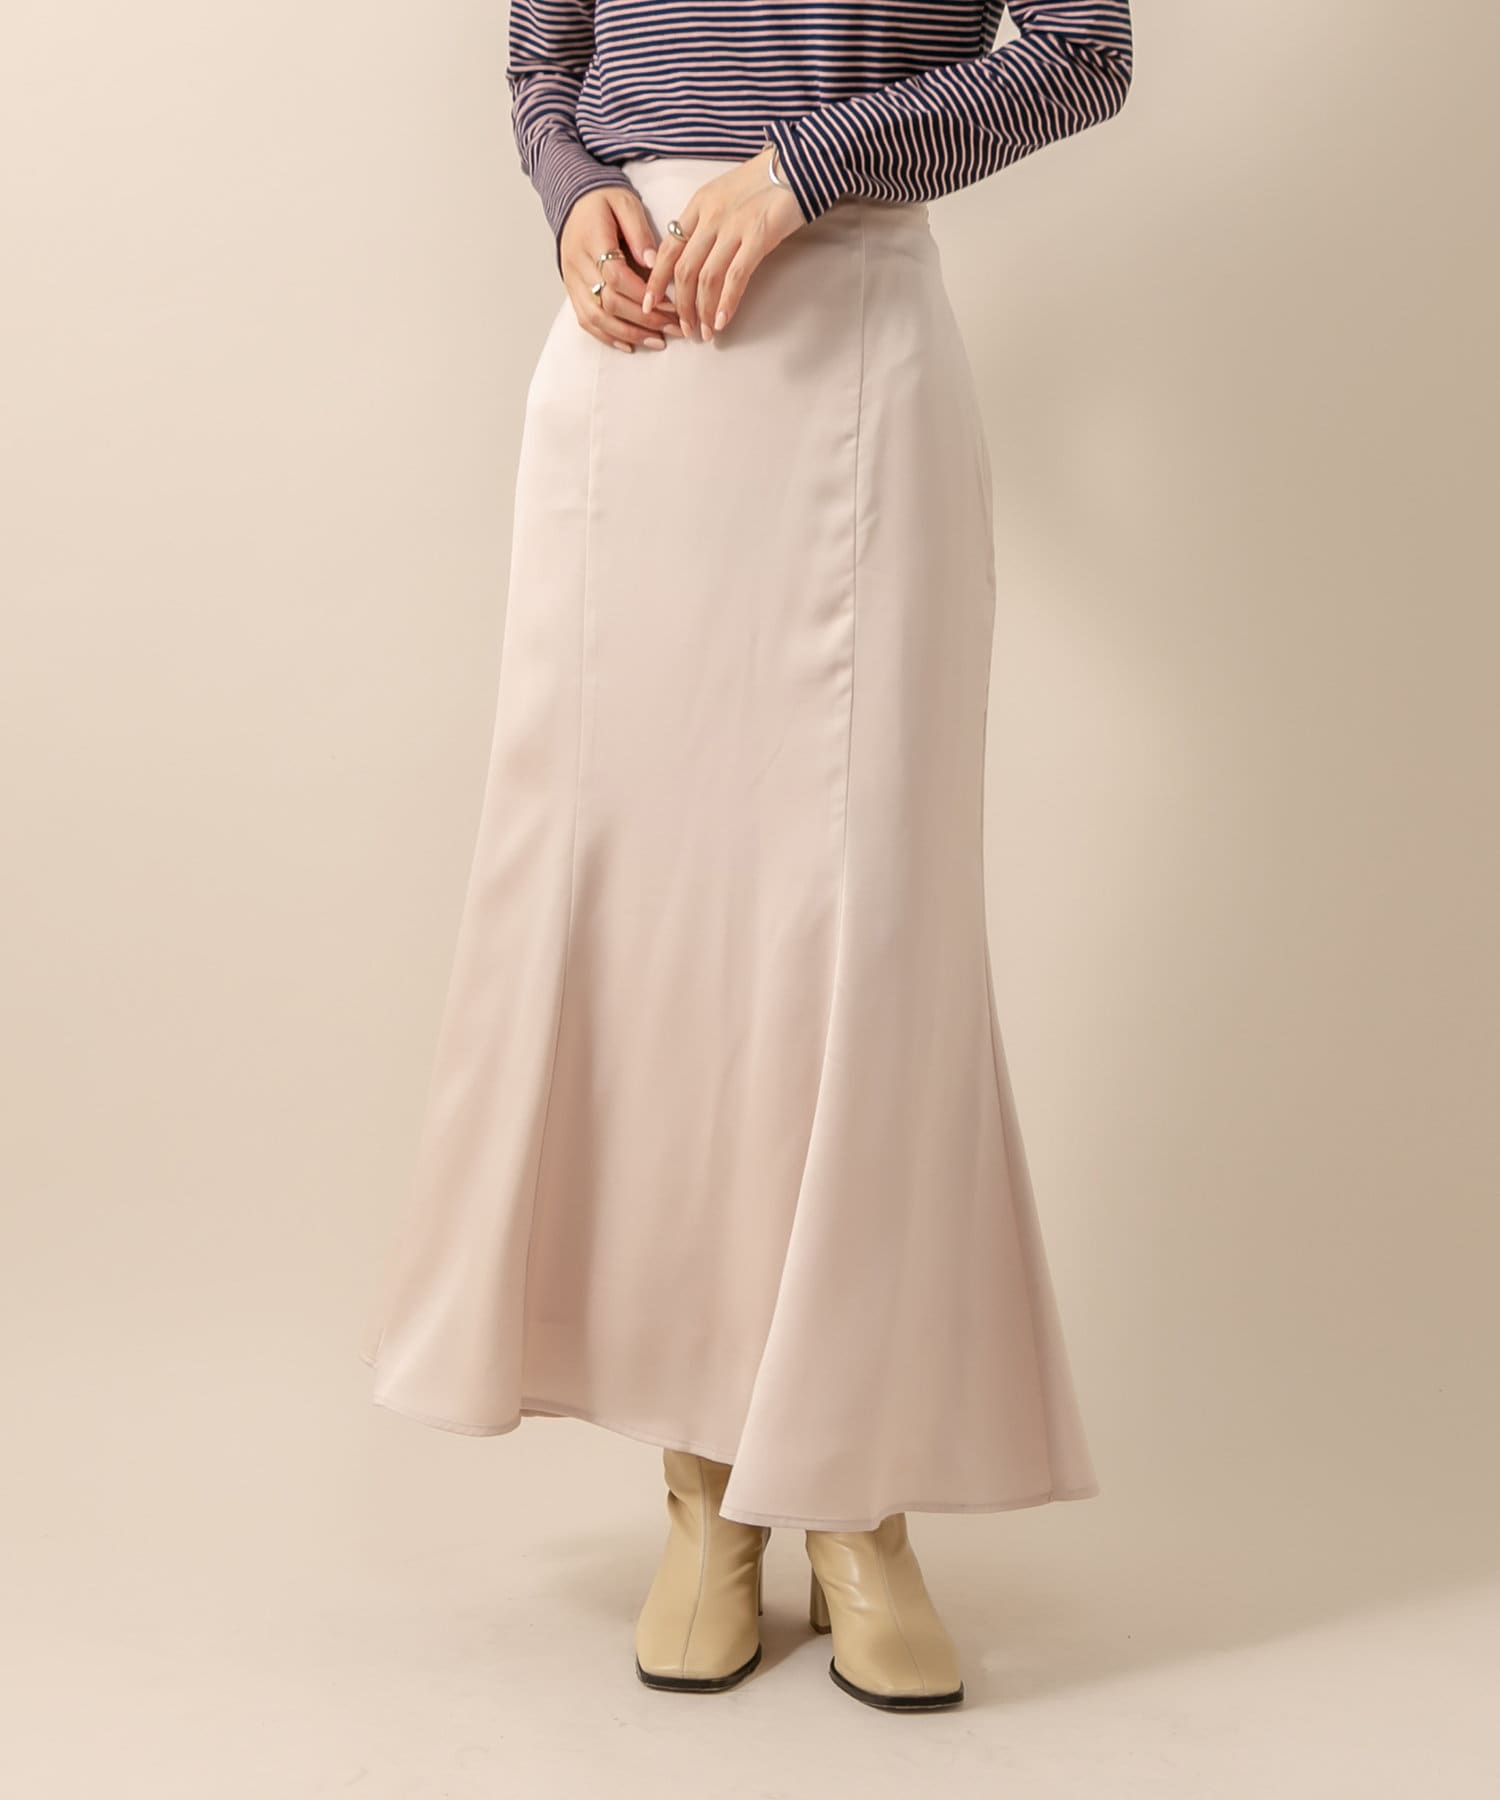 mystic(ミスティック) 【ライブコマース紹介】[mline] WEB限定 サテンマーメイドスカート